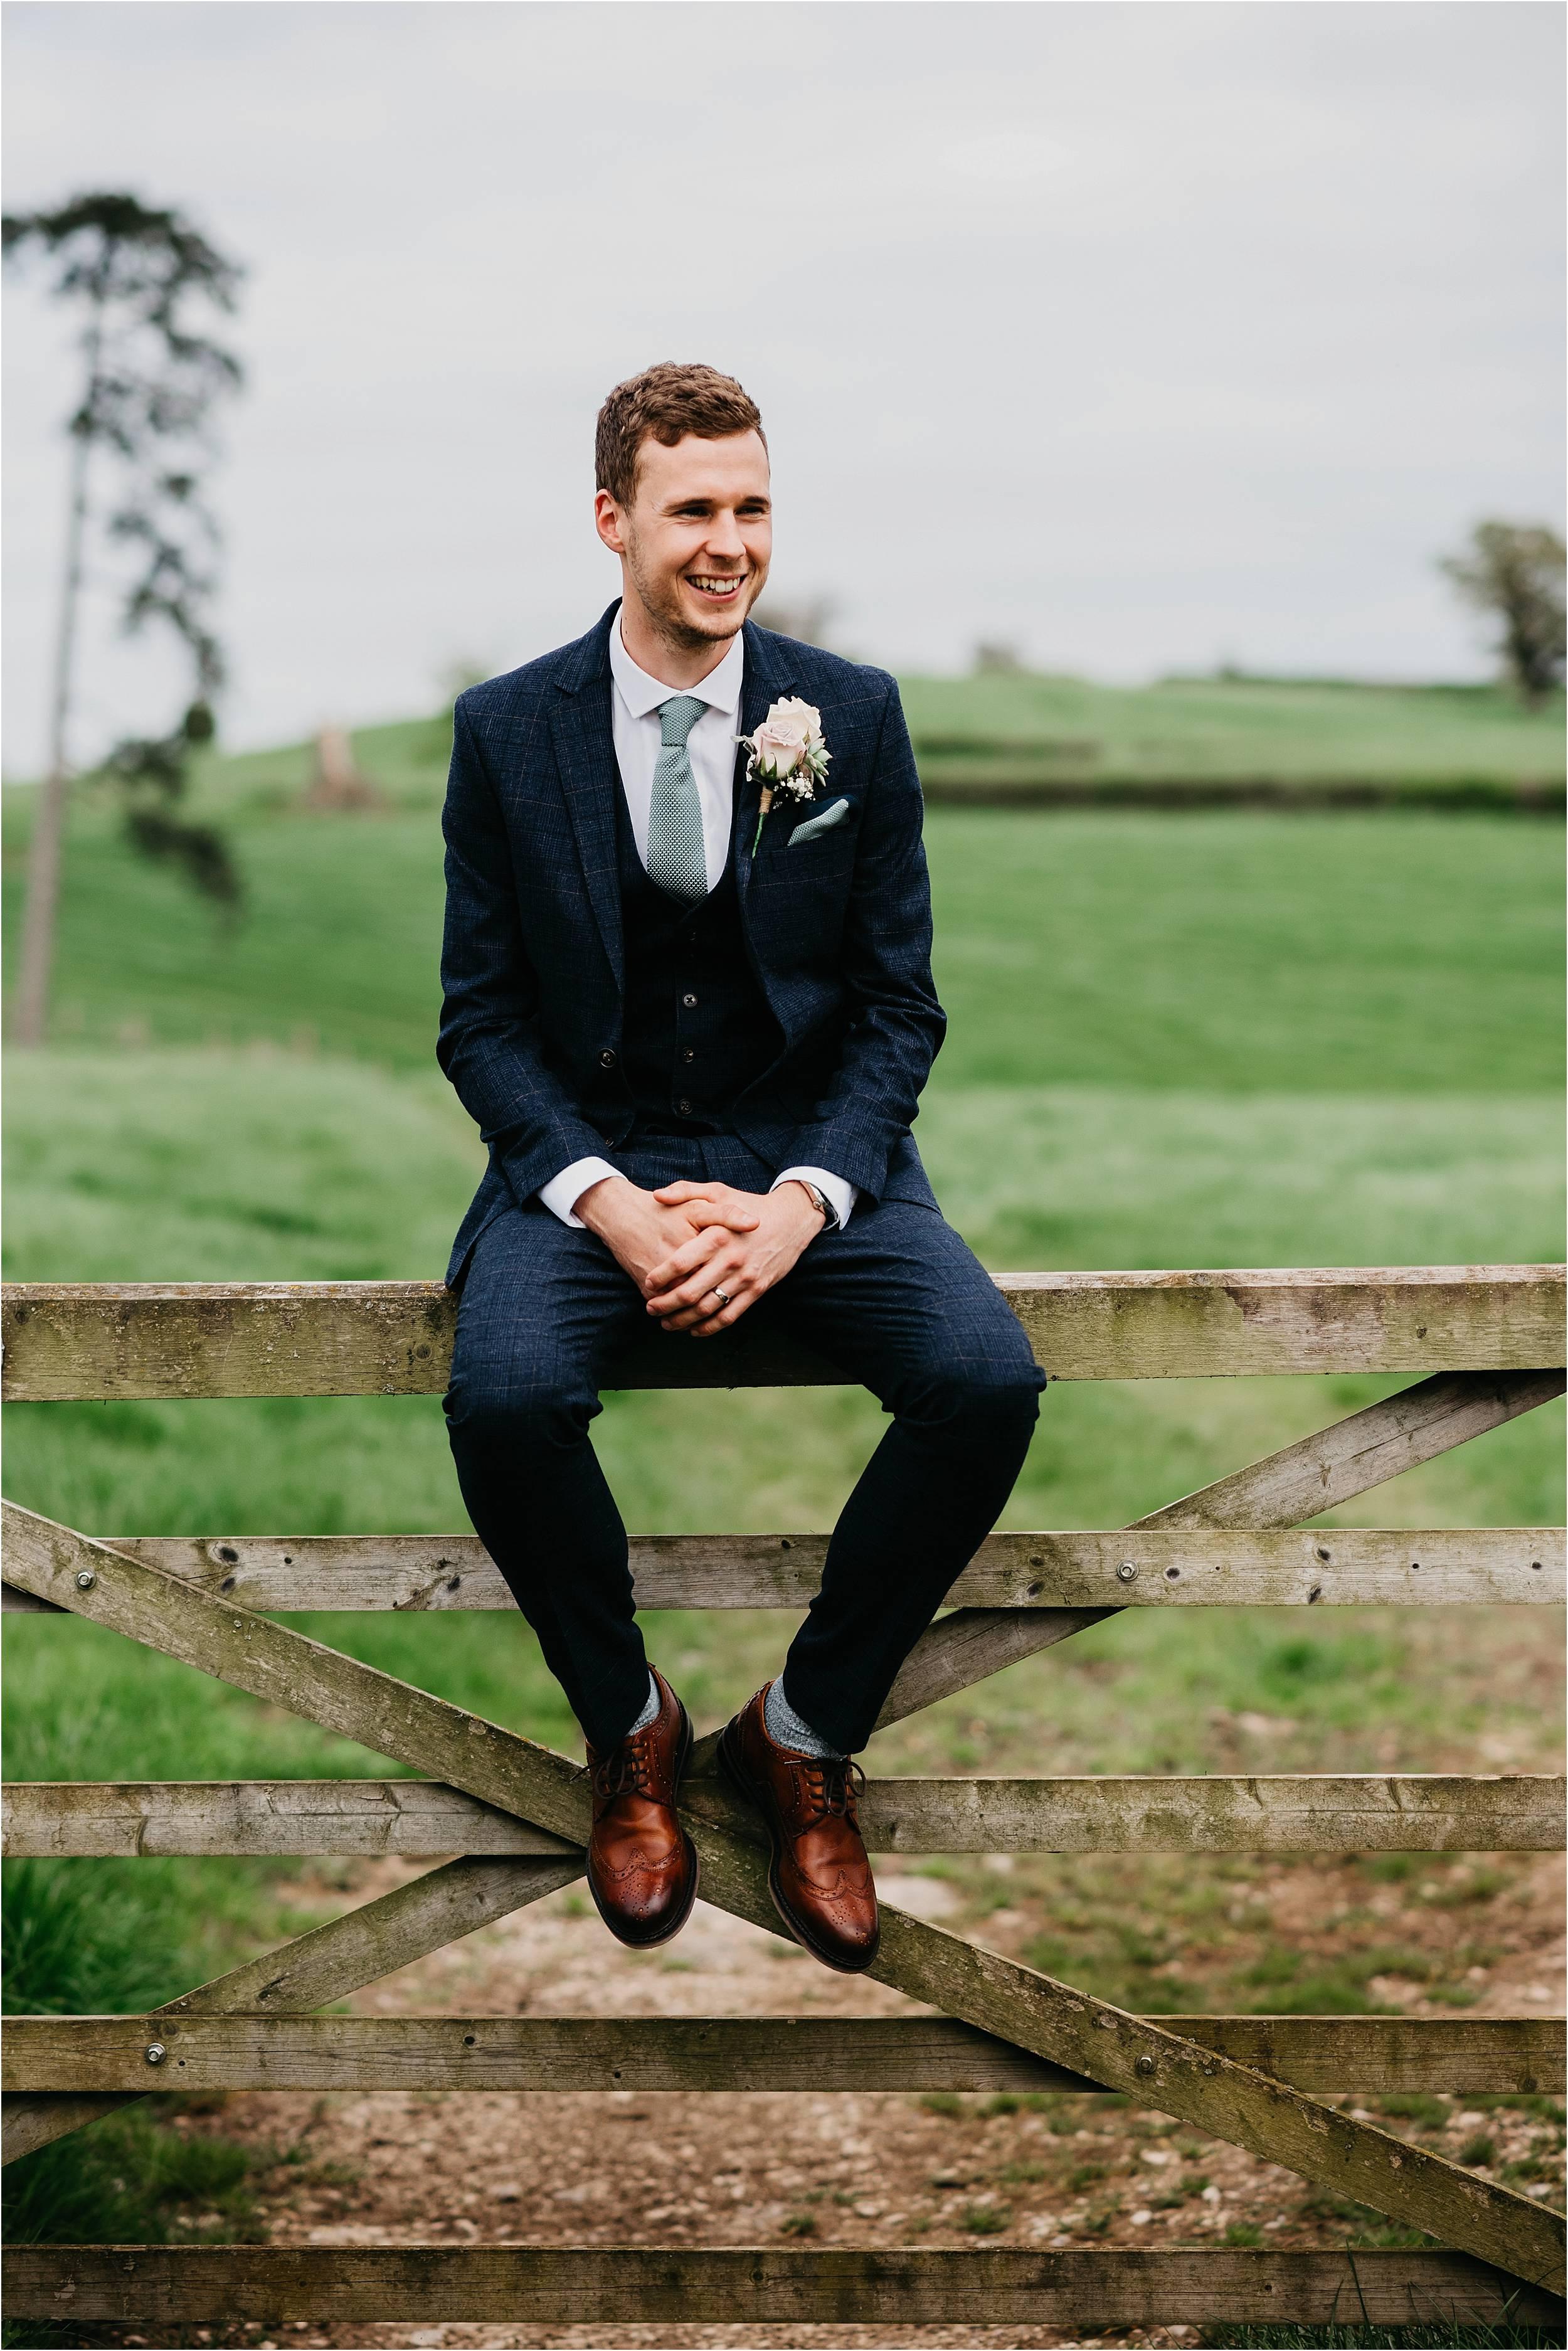 Kedleston Country House Wedding Photography_0068.jpg